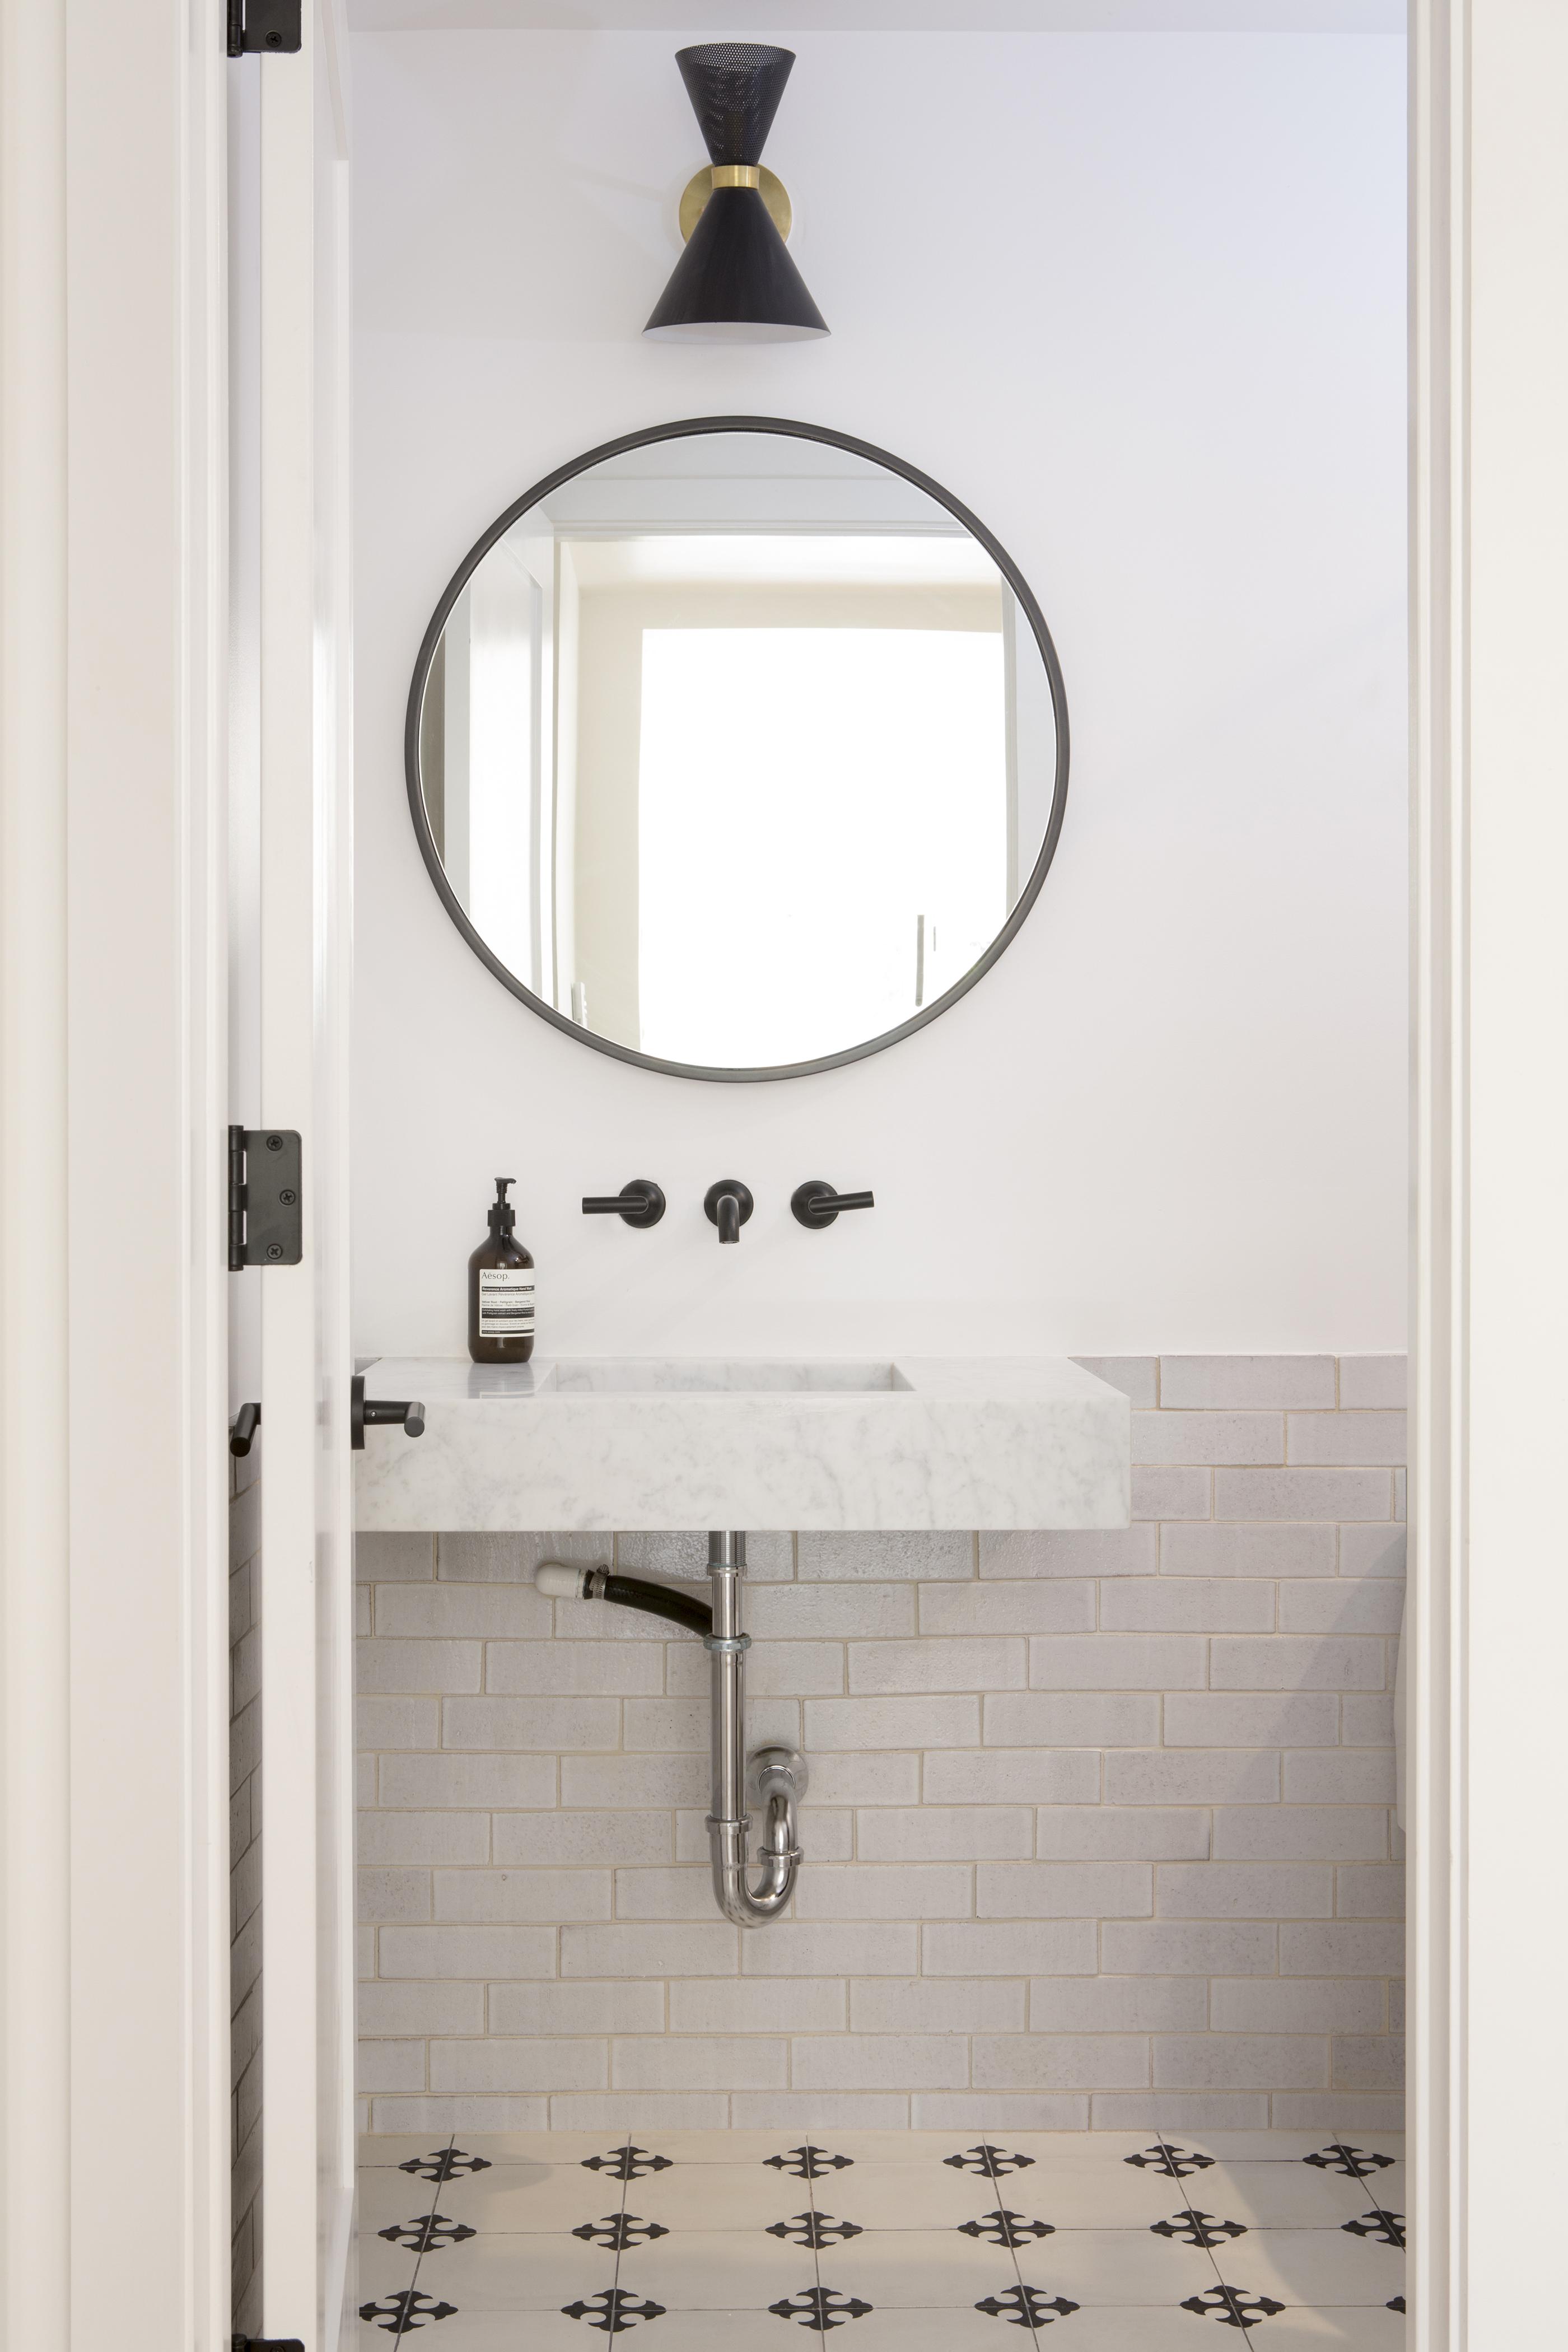 2017_Q4_image_residential_Anja_Michals_photo_vivian_johnson_bathroom_wainscot_wall_brick_cotton.jpg